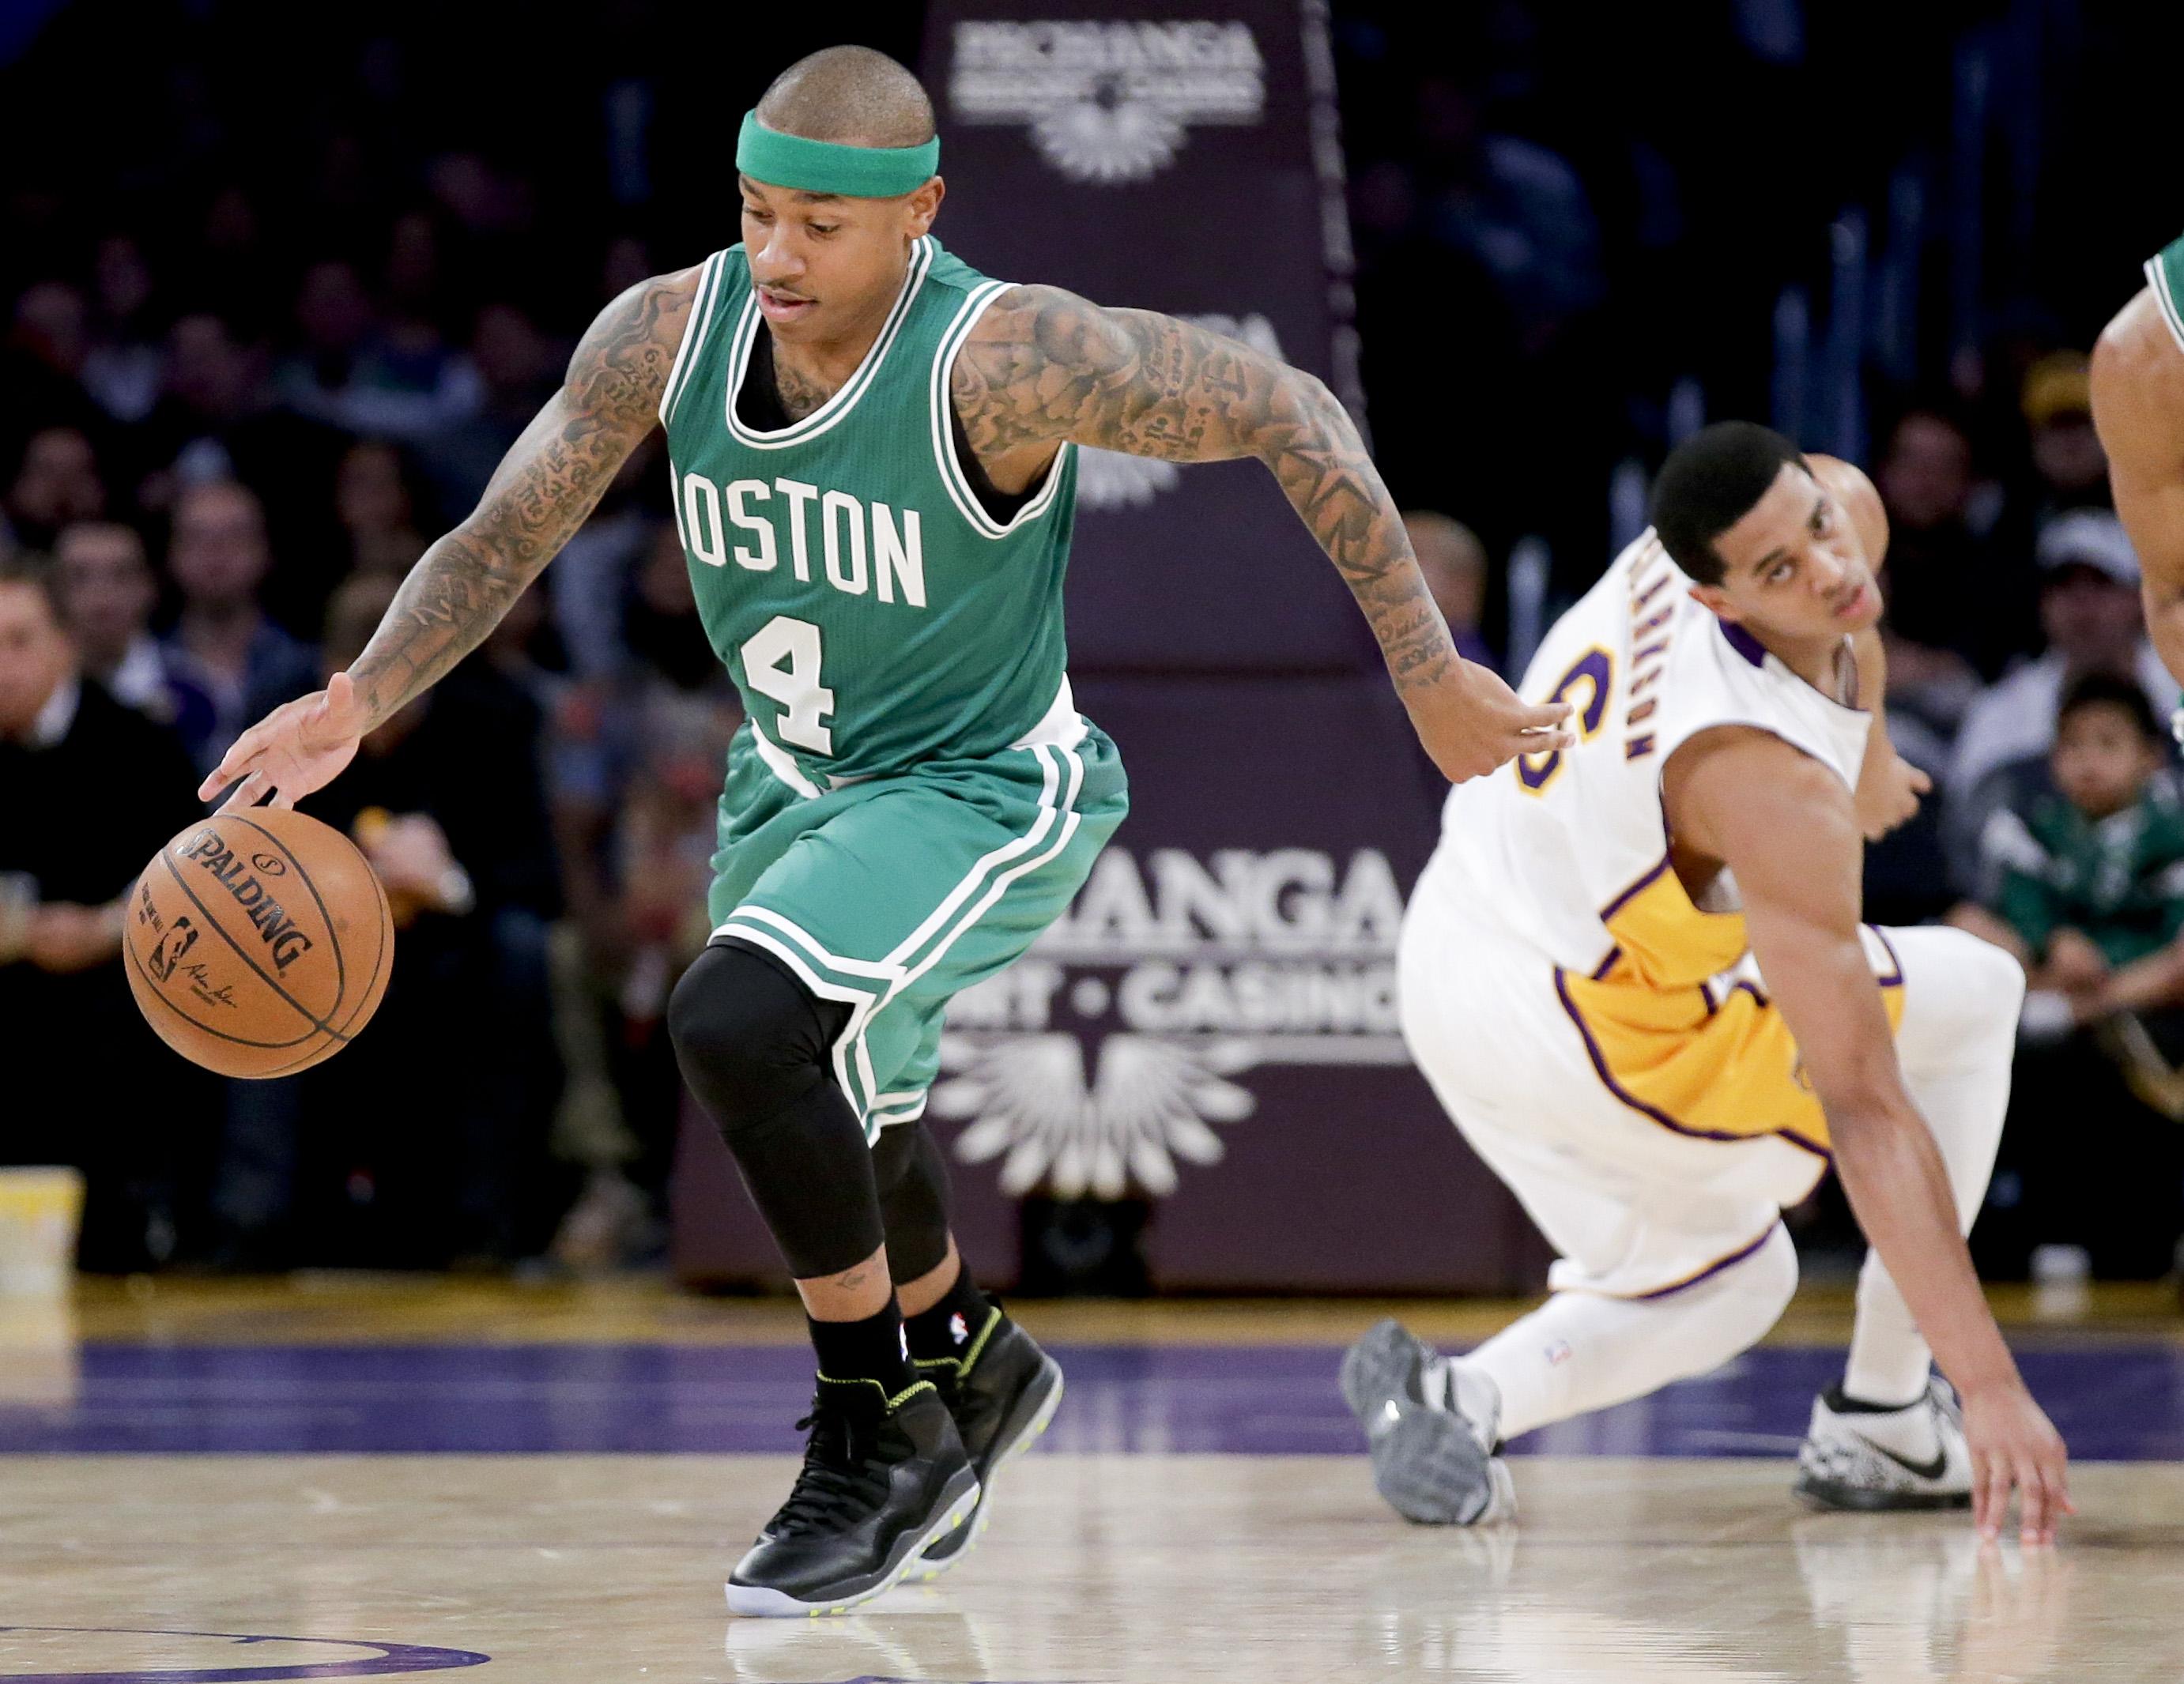 Isaiah Thomas Gets Appraisal From Celtics Legend Nate Tiny